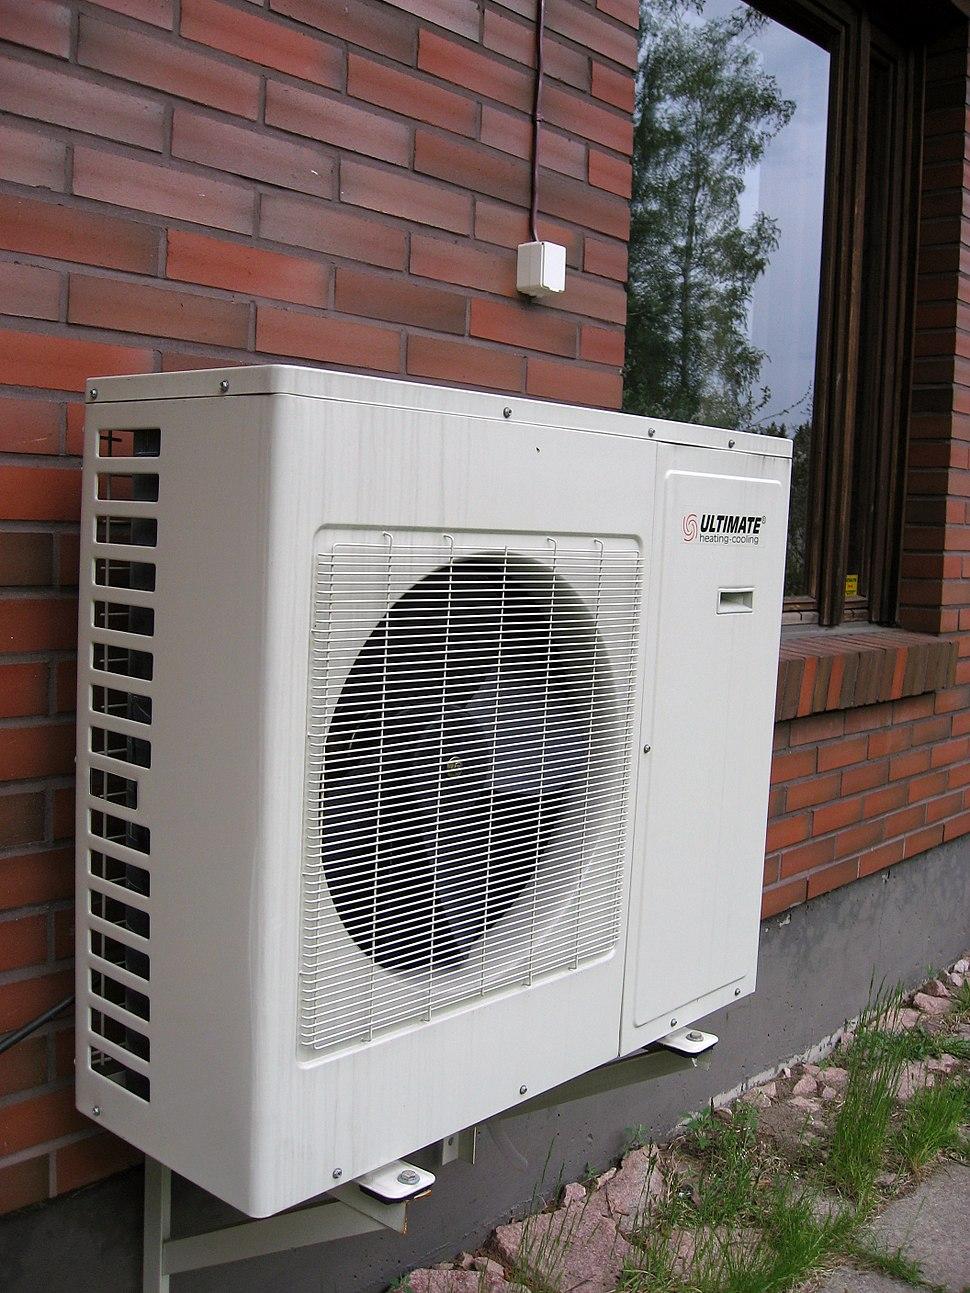 Outunit of heat pump